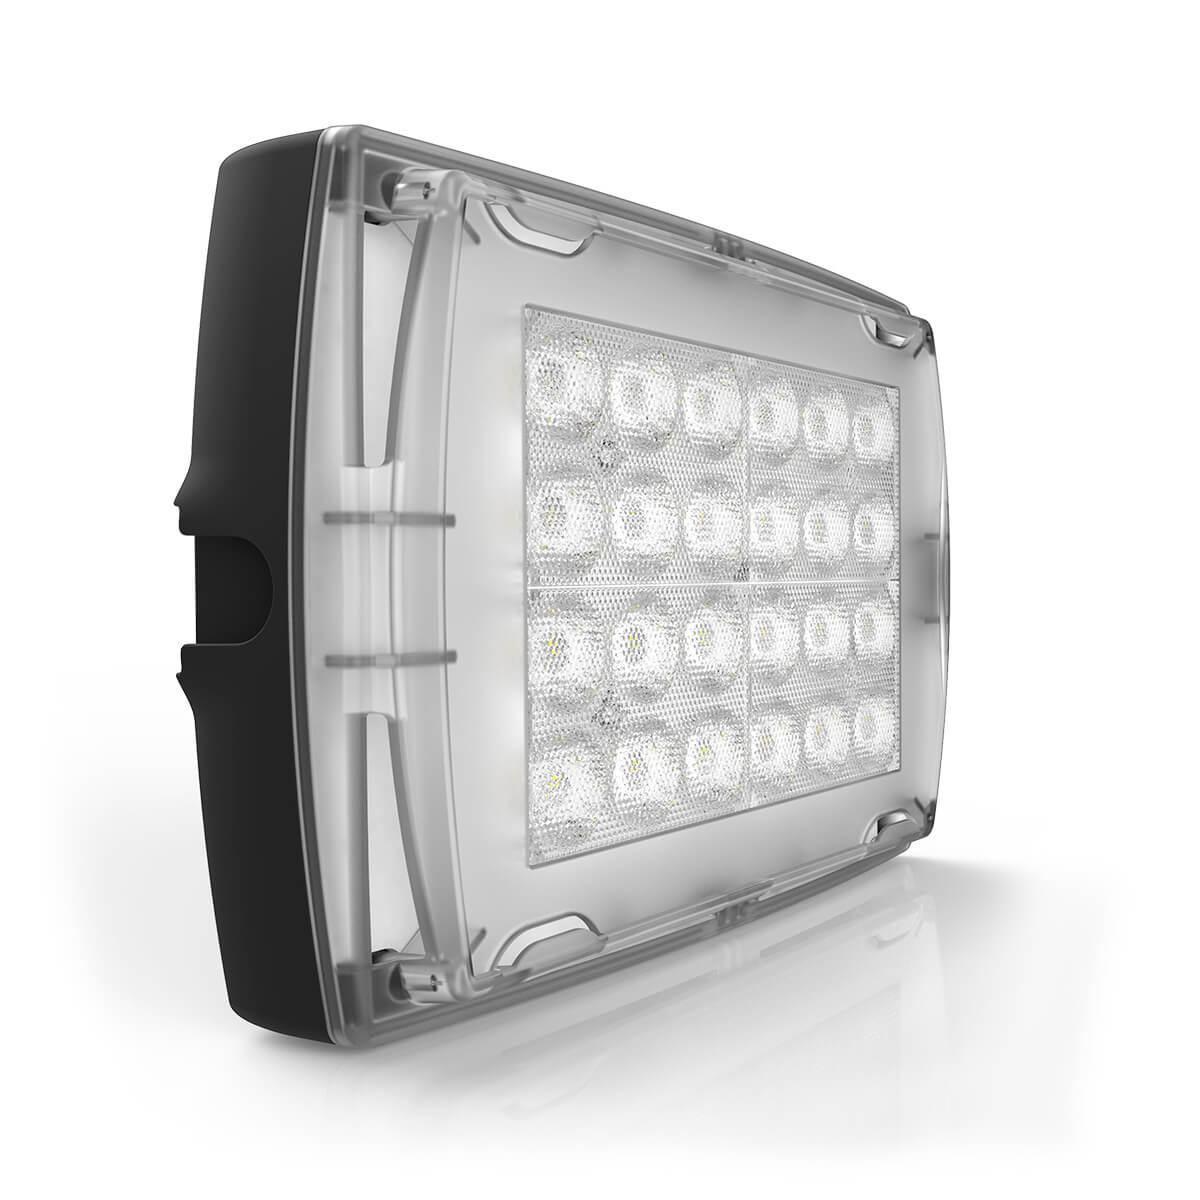 Camera Light Fixture: Litepanels MLCroma2 Camera-Mounted LED Lighting Fixture